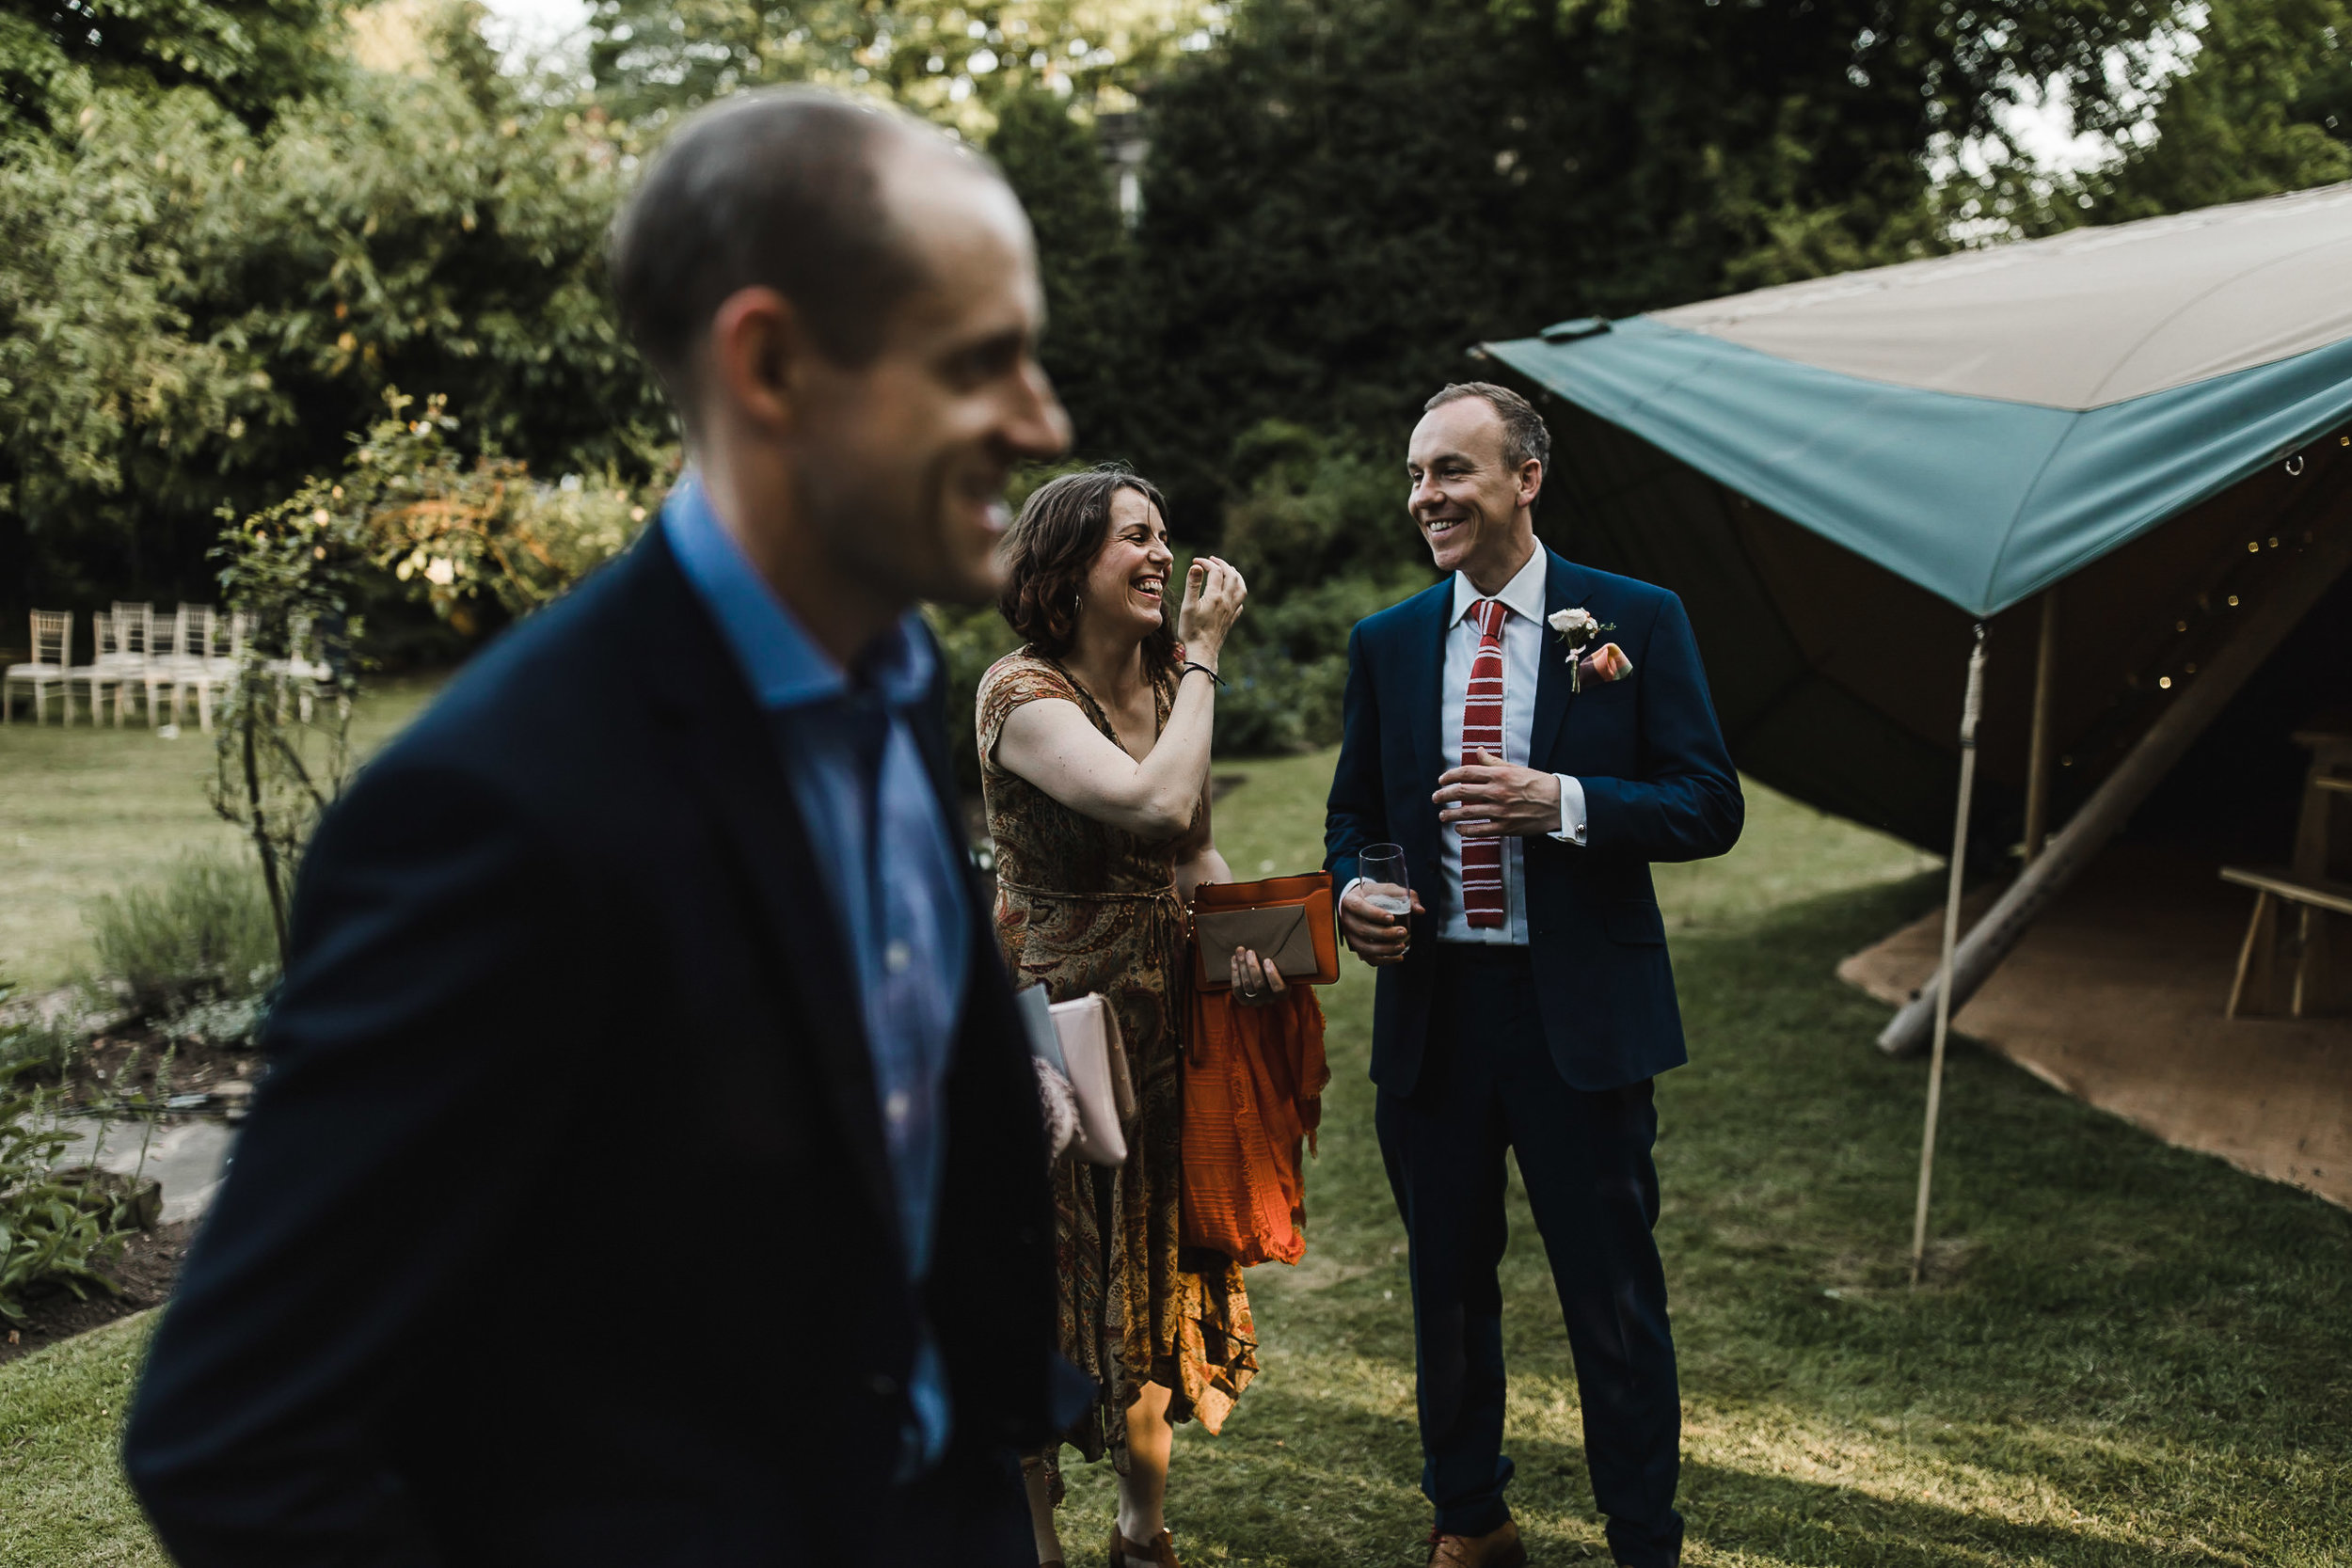 Roundhay-Leeds-Backyard-Wedding-Becs-Chris-208.jpg